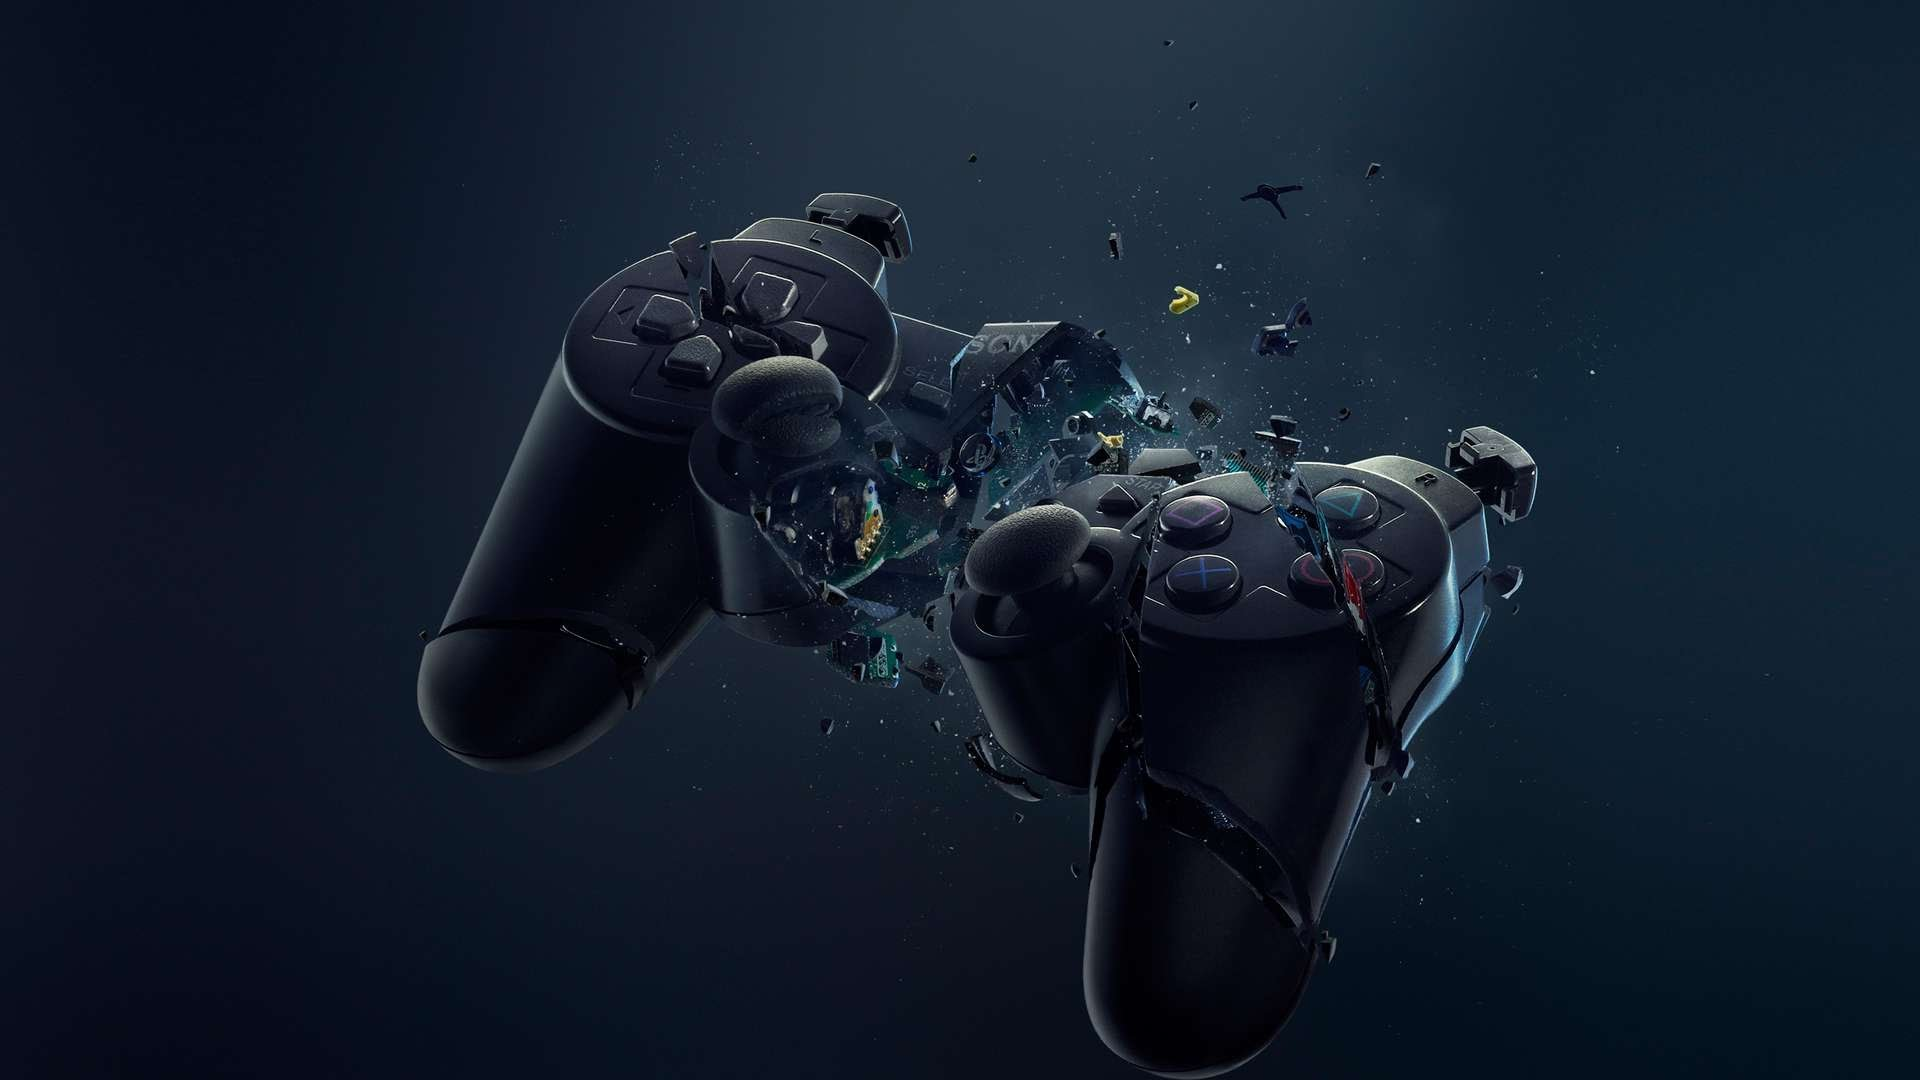 broken-controller